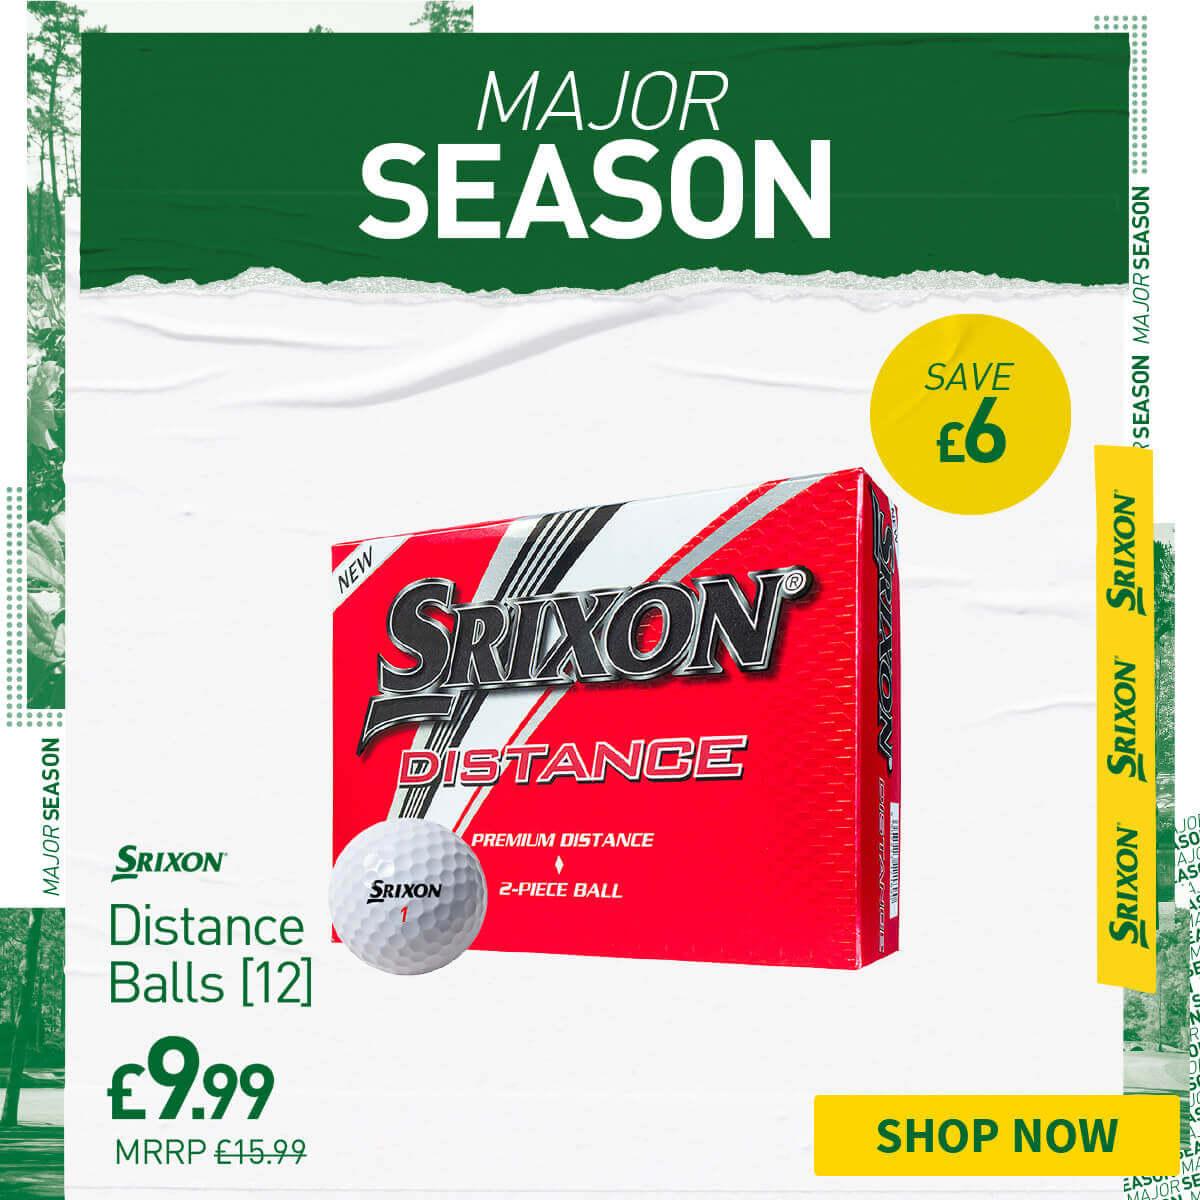 SRIXON DISTANCE BALLS 12 PACK - ONLY £9.99